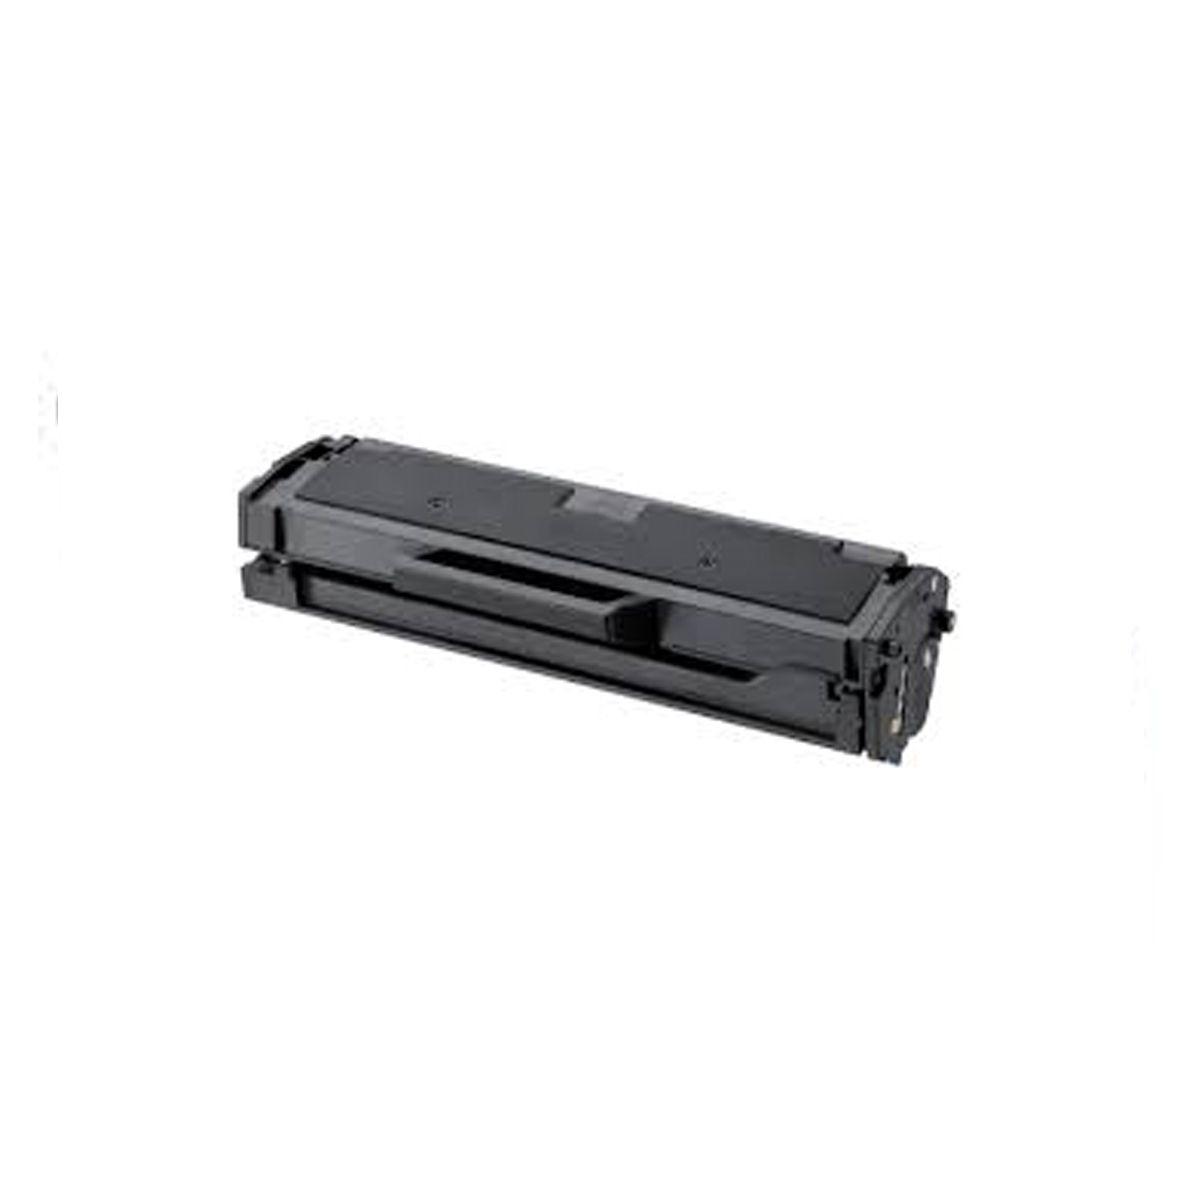 Toner Samsung D111S D111 111 - M2020 M2070 - Compativel 07-B2Z7-ZWYK